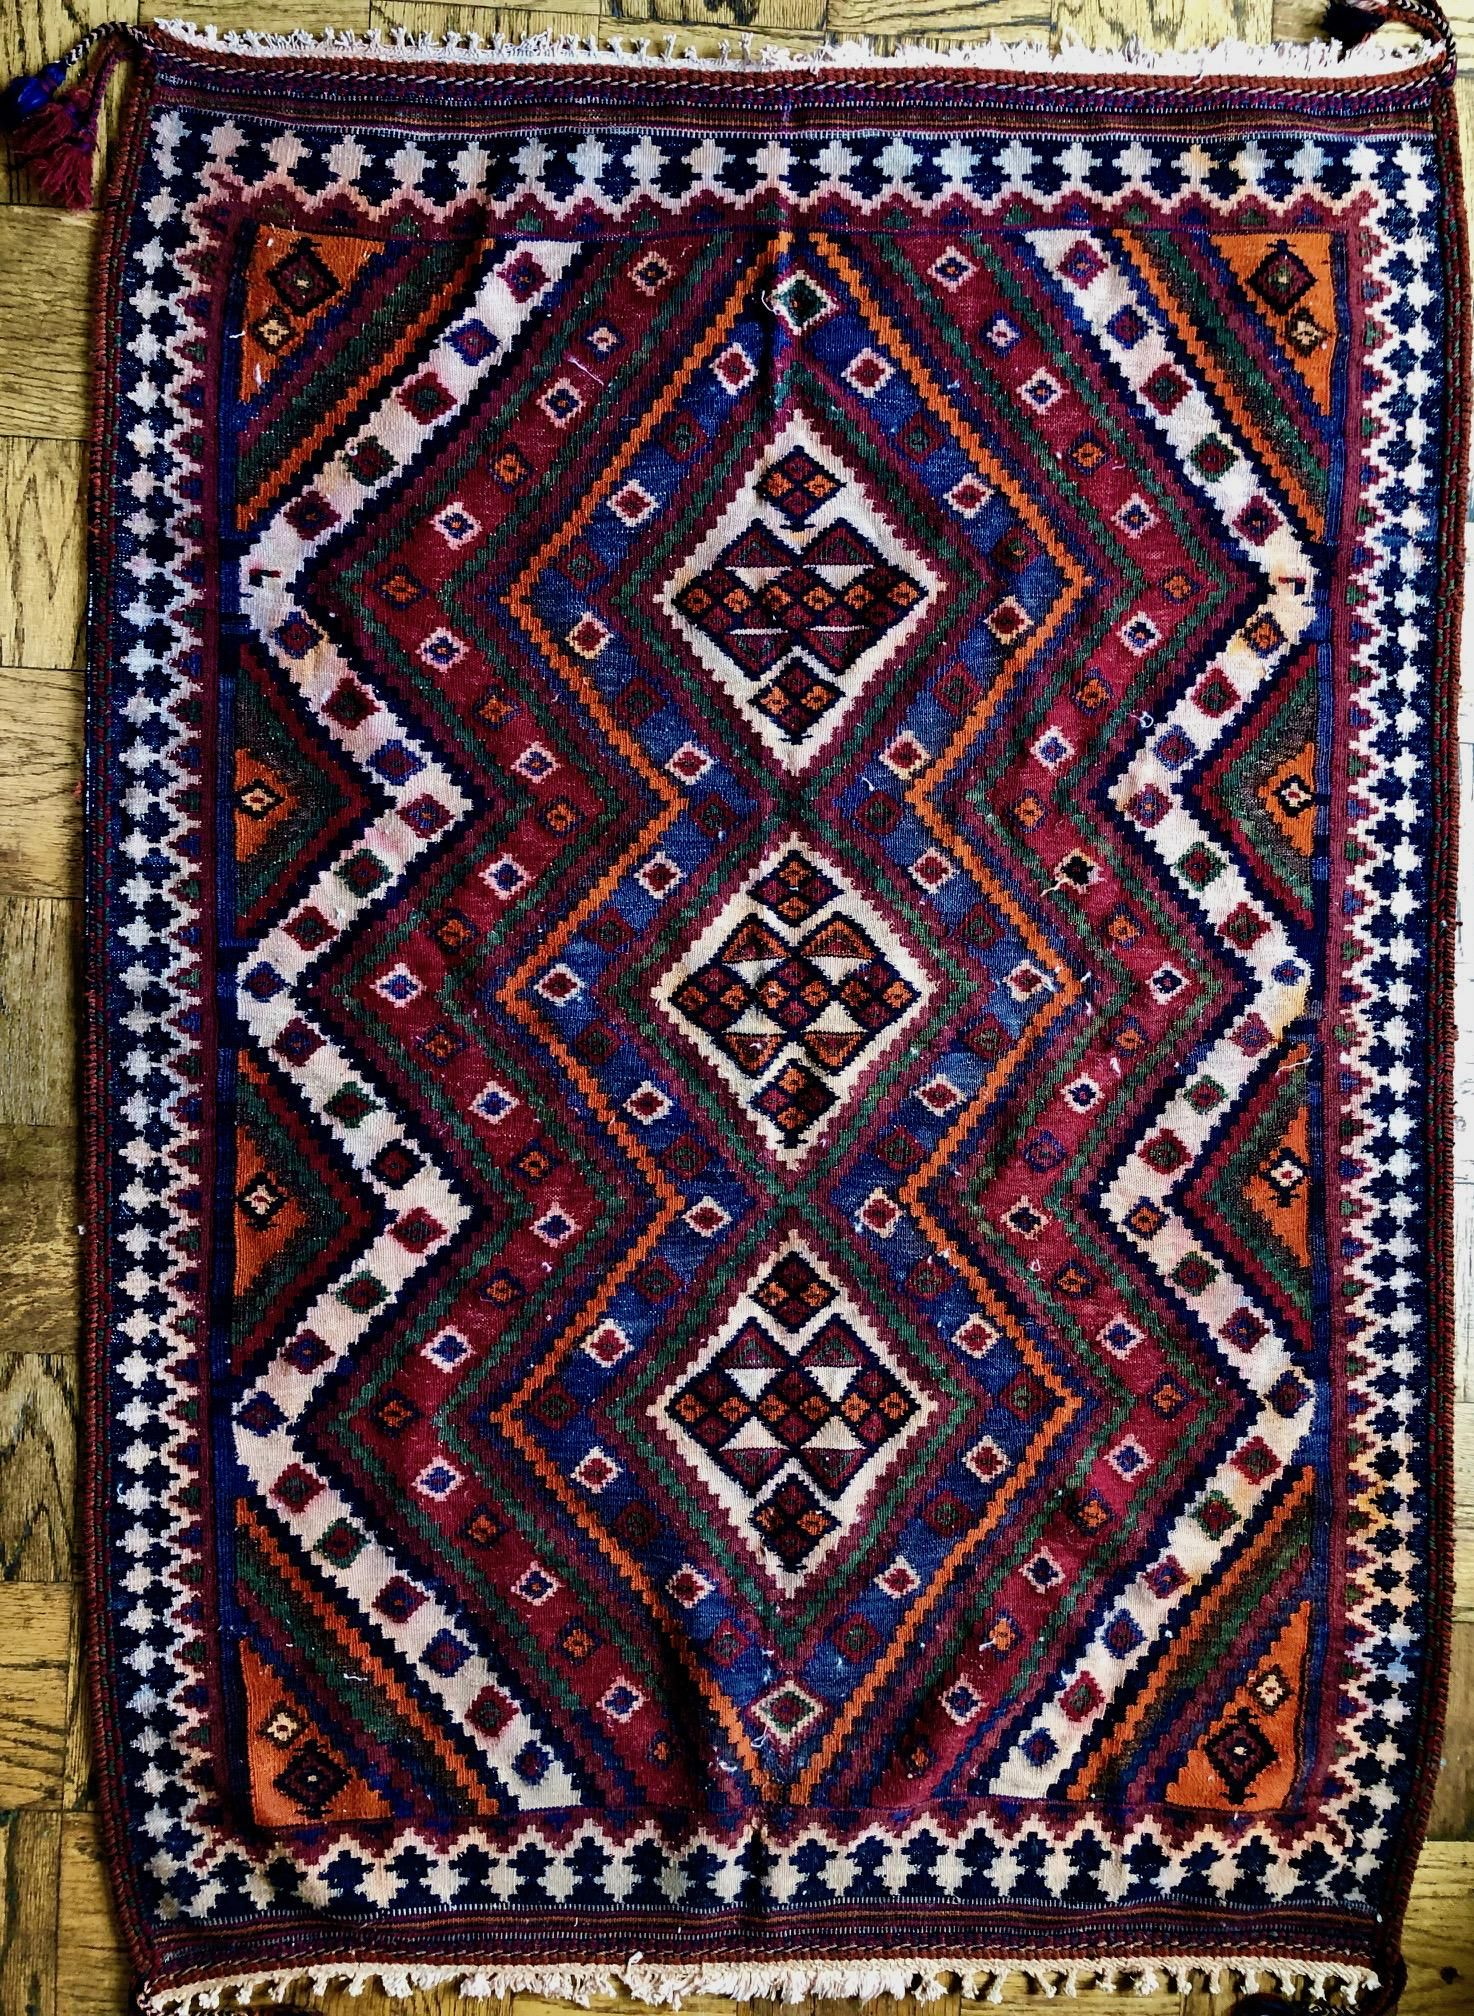 Semi-Antique Handwoven Tribal Kilim Rug: 6 1/2 x 5 feet